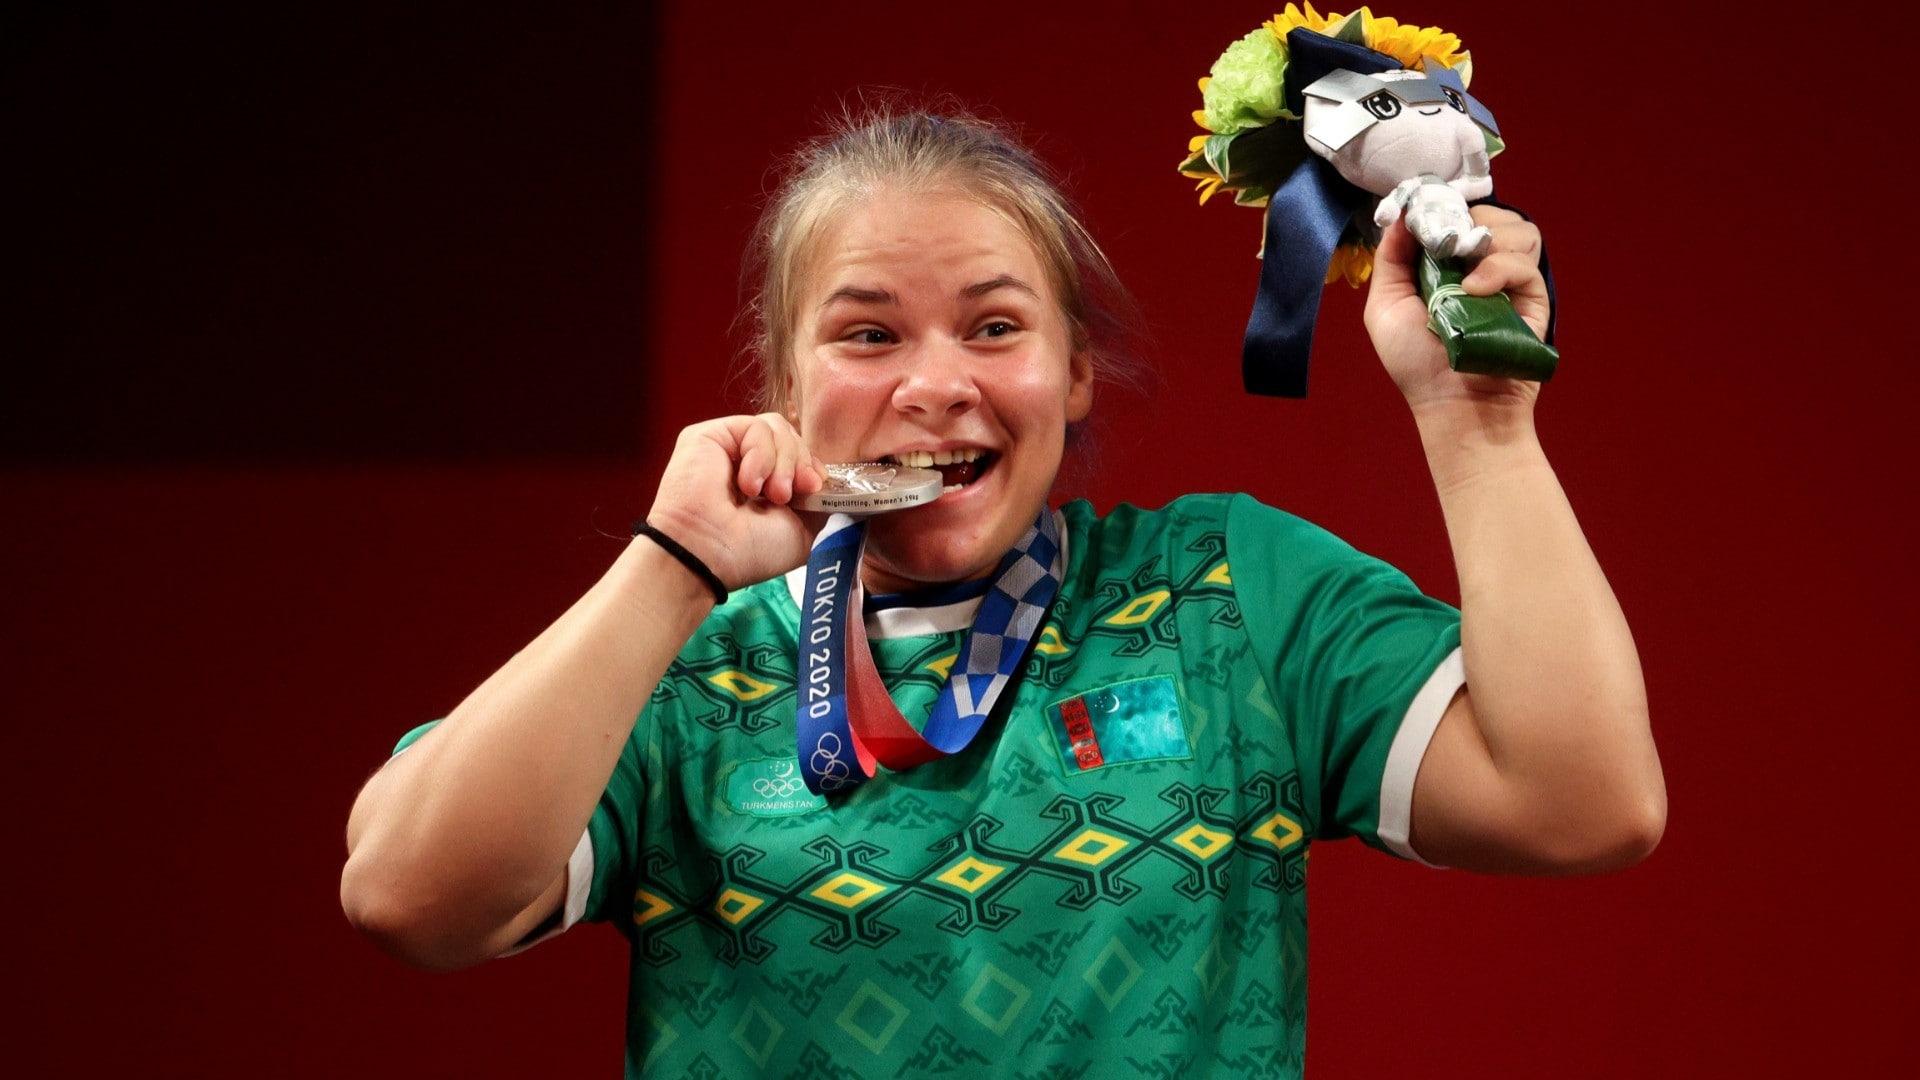 Turkmenistan's Polina Guryeva takes home silver (credit: Getty)